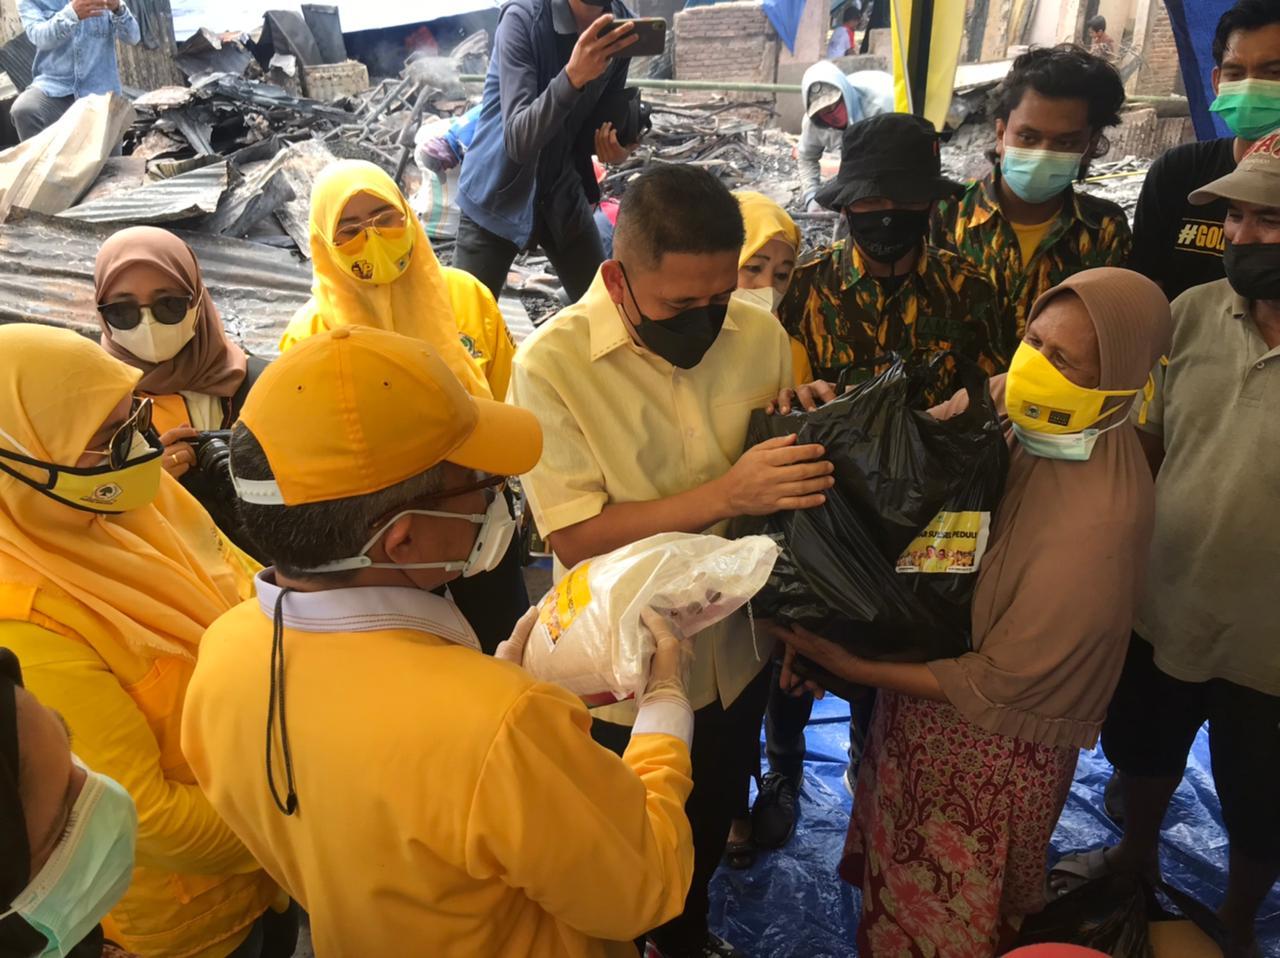 Taufan Pawe Pimpin Kader Golkar Sulsel Serahkan Bantuan Bagi Korban Kebakaran di Tamalate